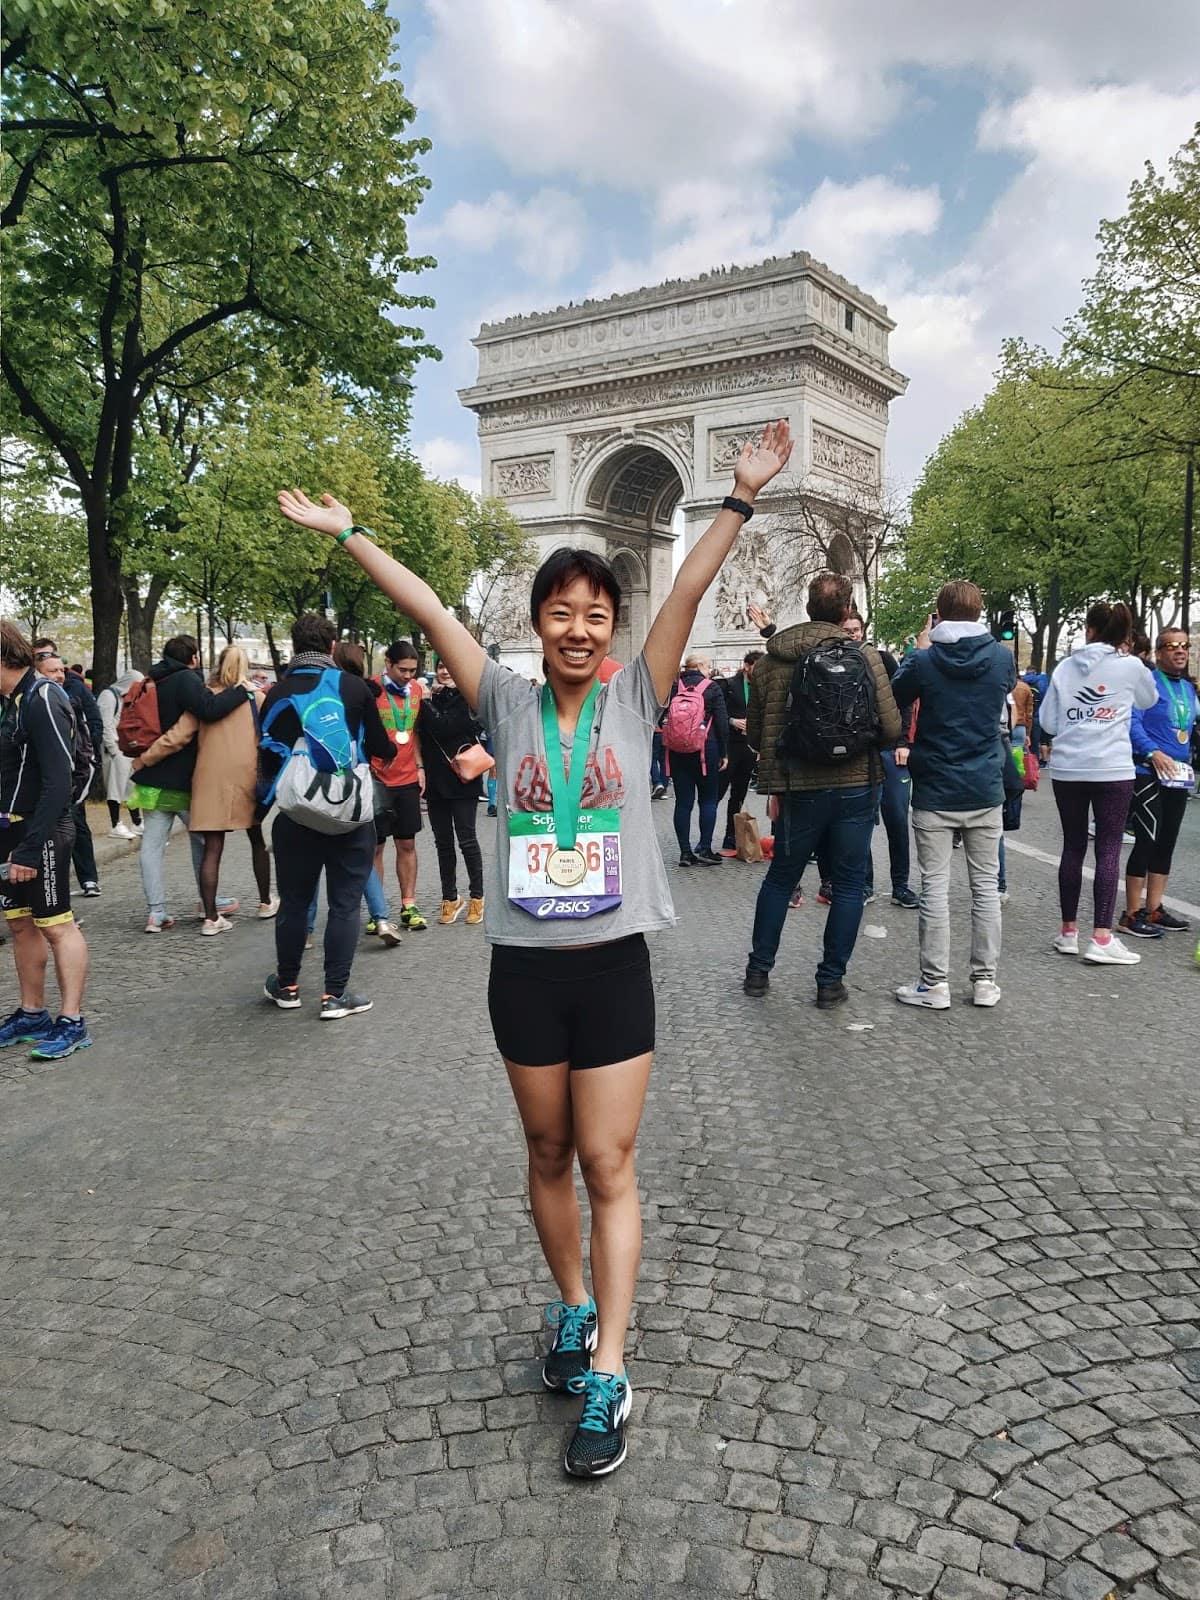 Me at the Paris Marathon in front of the Arc de Triomphe